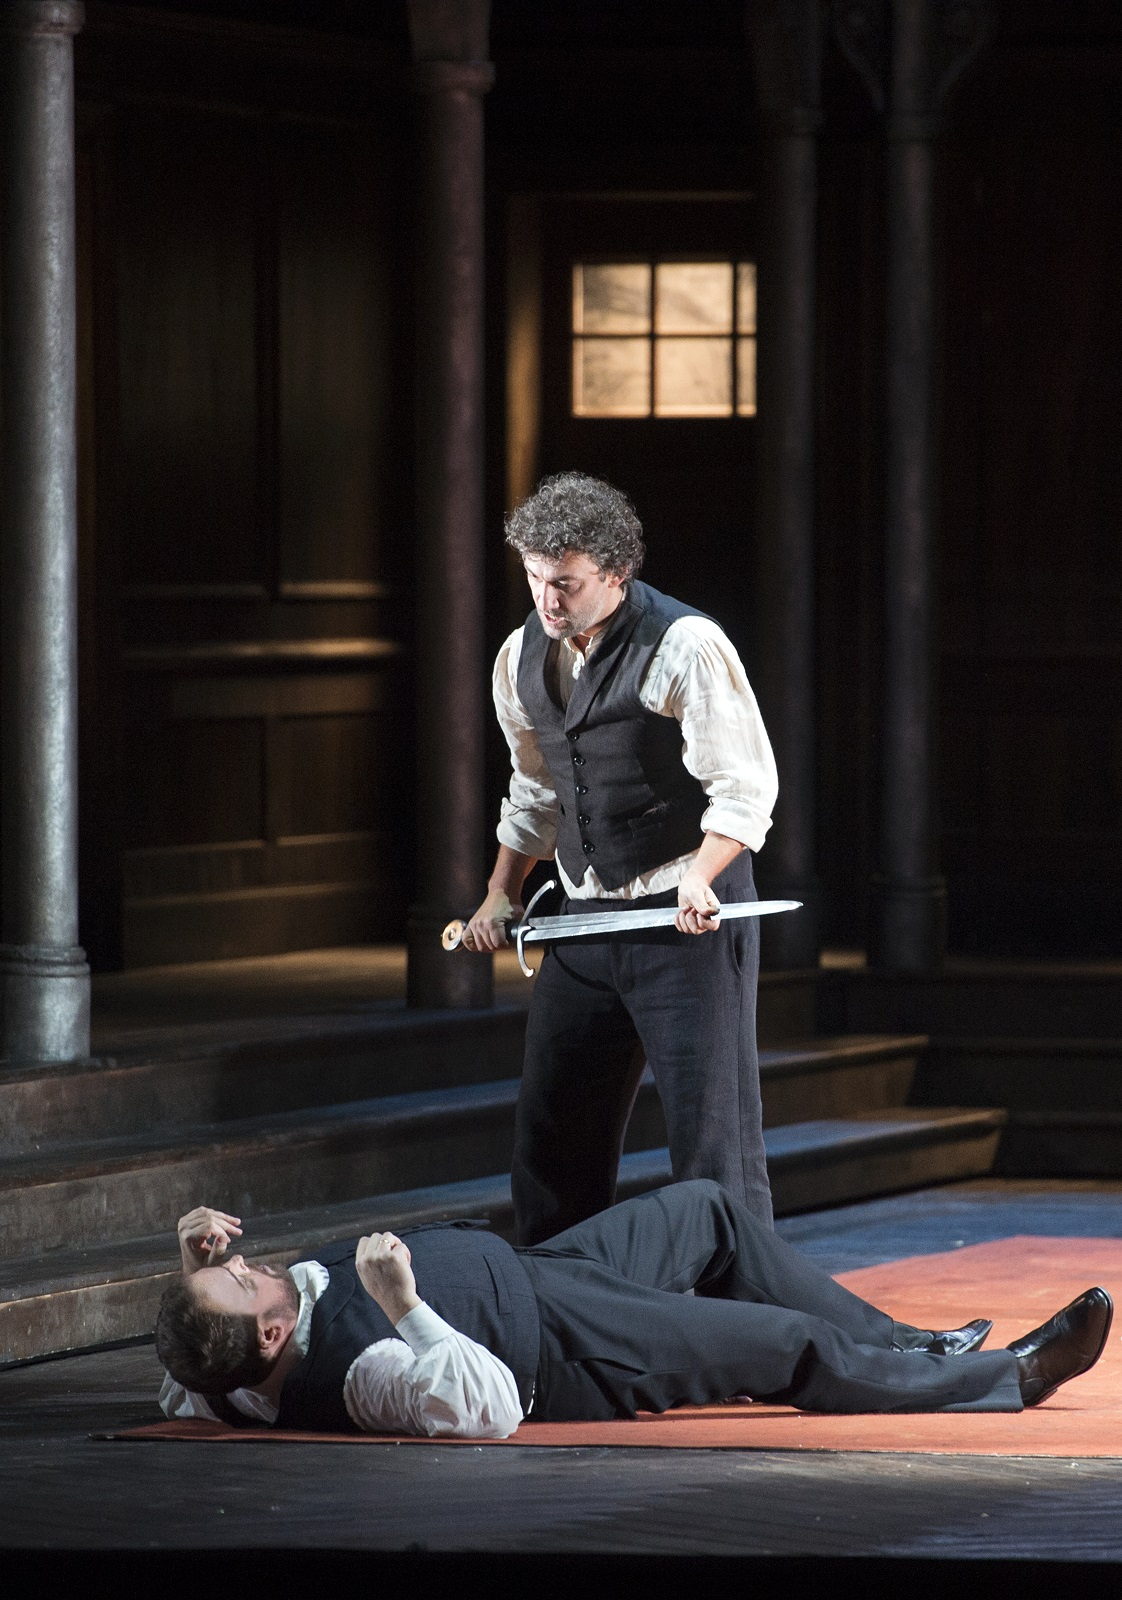 Jonas Kaufmann (Lohengrin) et Tomasz Konieczny (Friedrich Von Telramund) (© Monika Rittershaus / Opéra national de Paris)